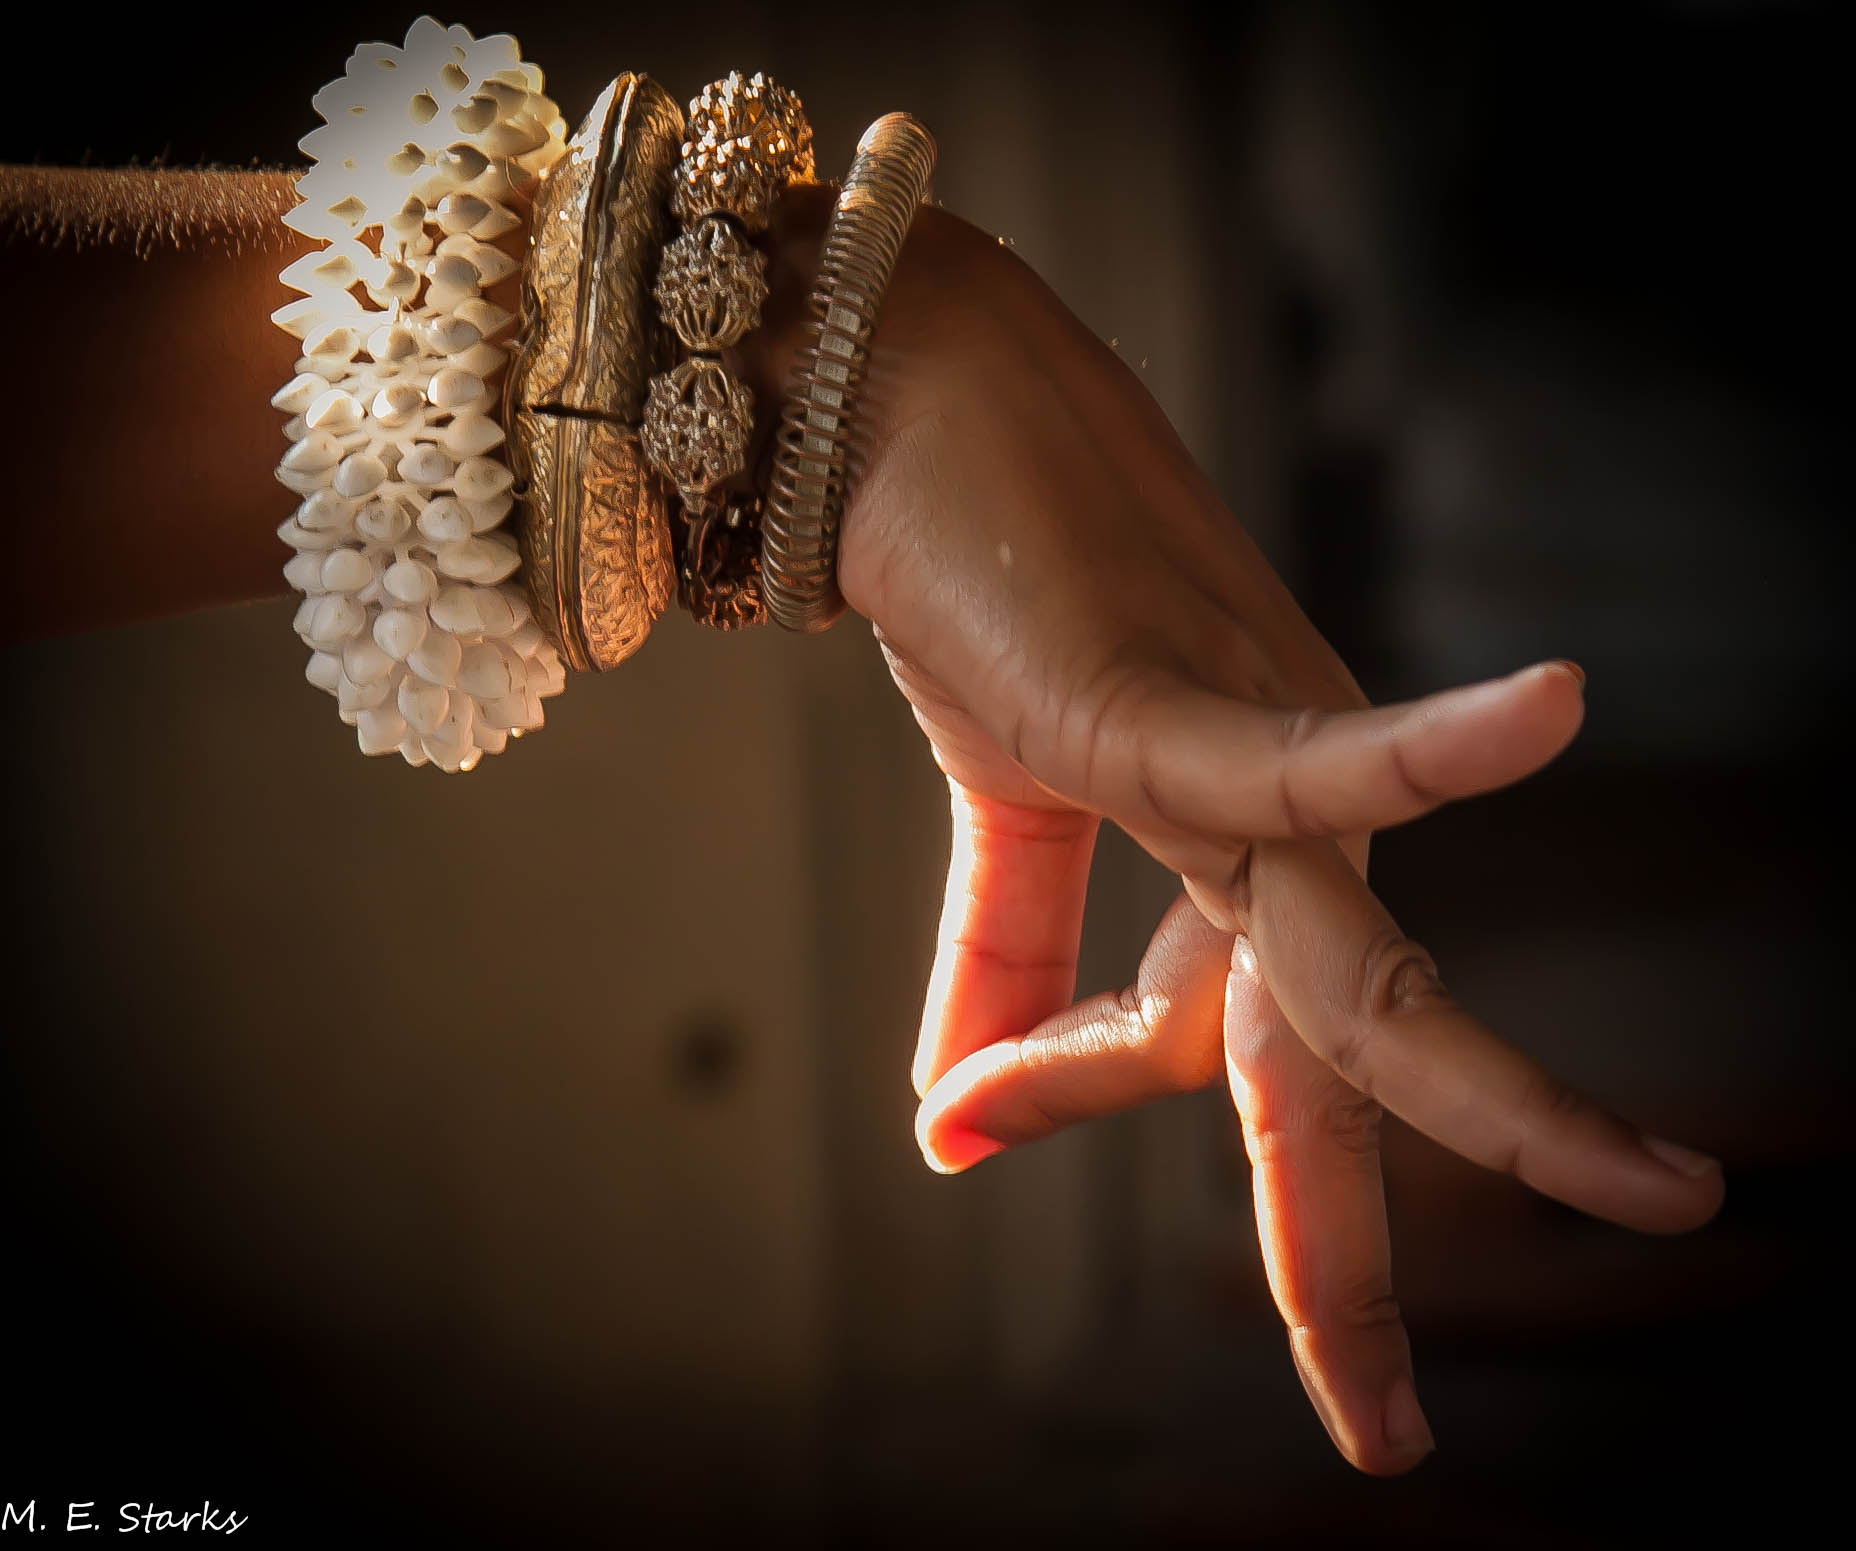 A Dancer's Hand, Angkor Wat, Cambodia